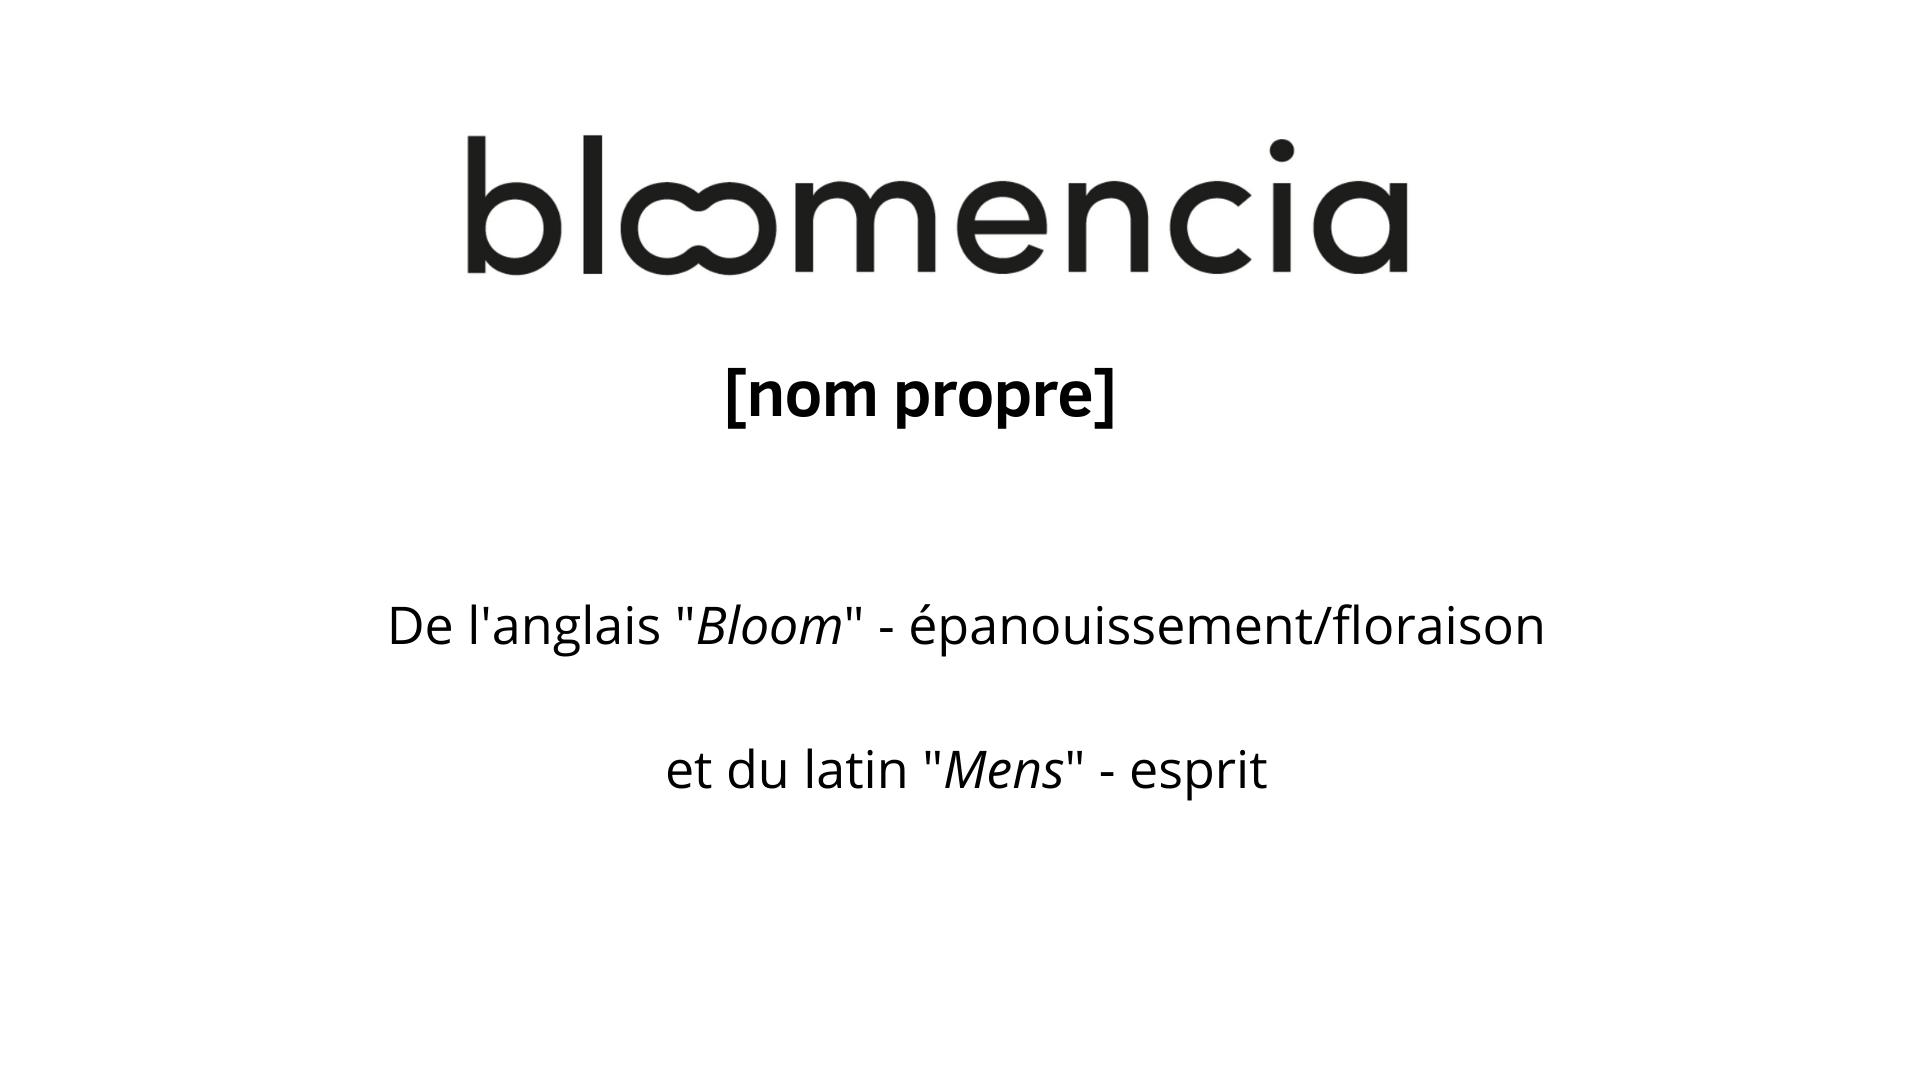 bloomencia definition